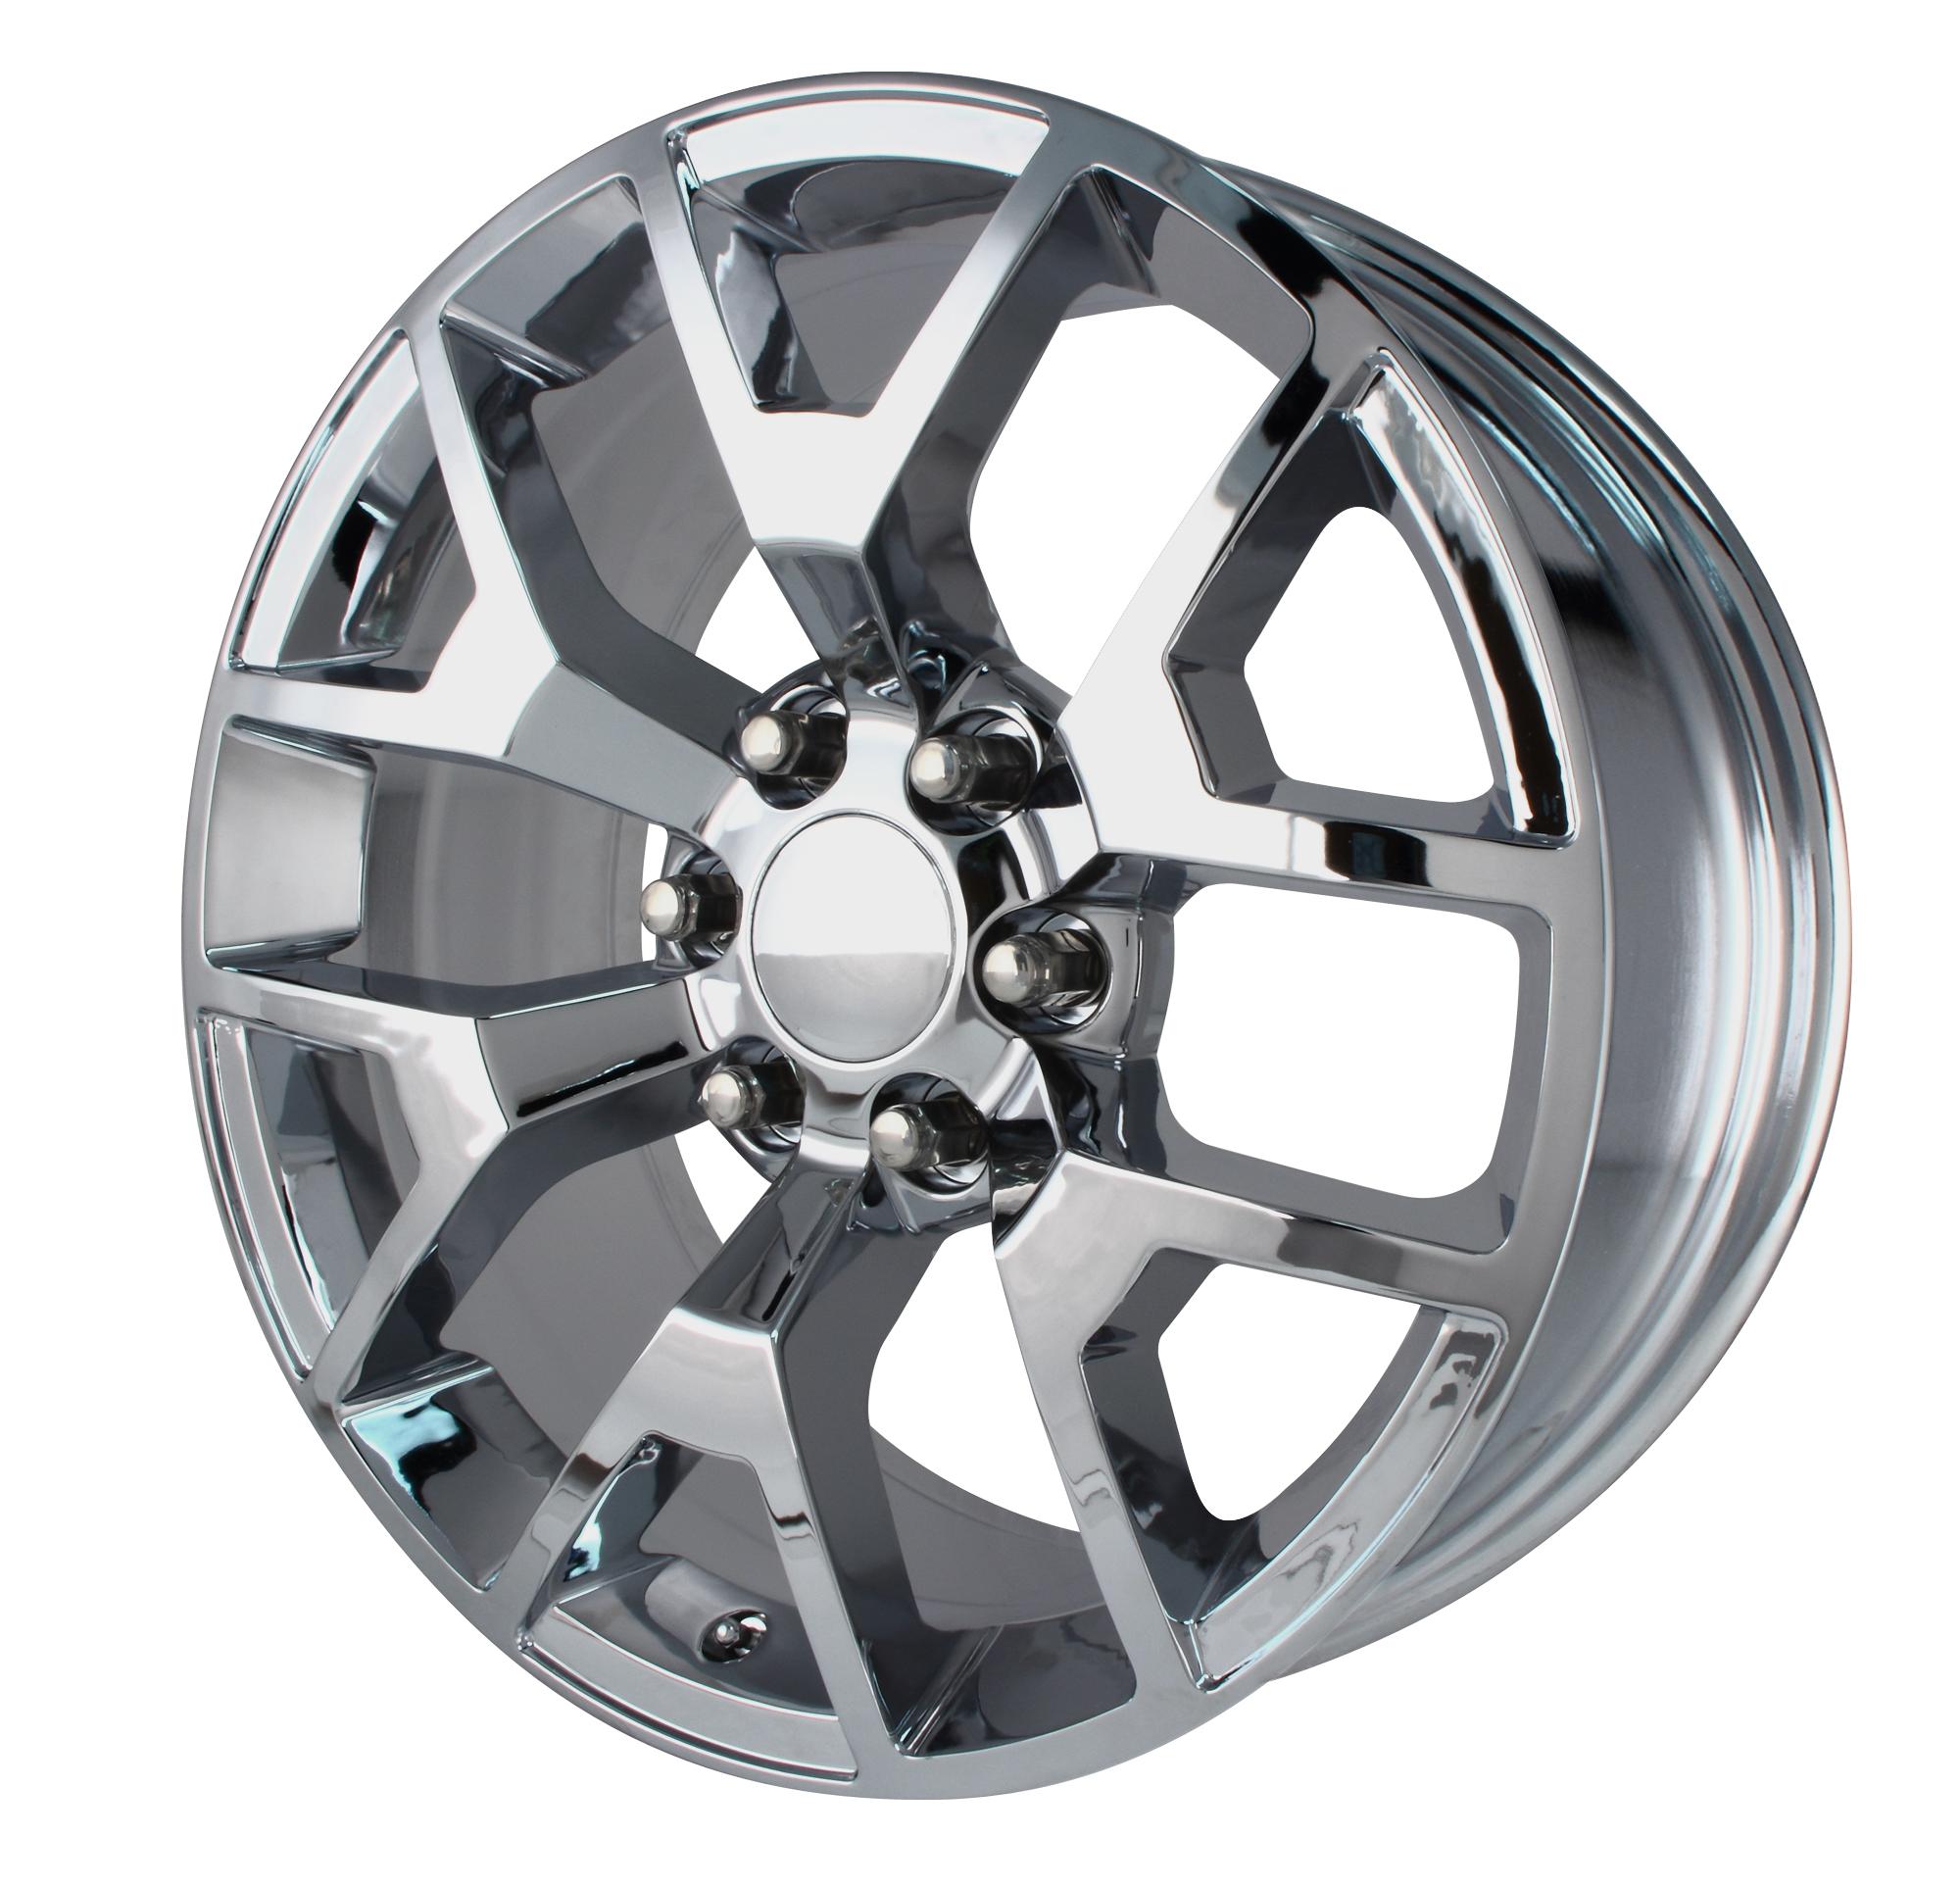 OE Creations Replica Wheels OE Creations PR169 Chrome